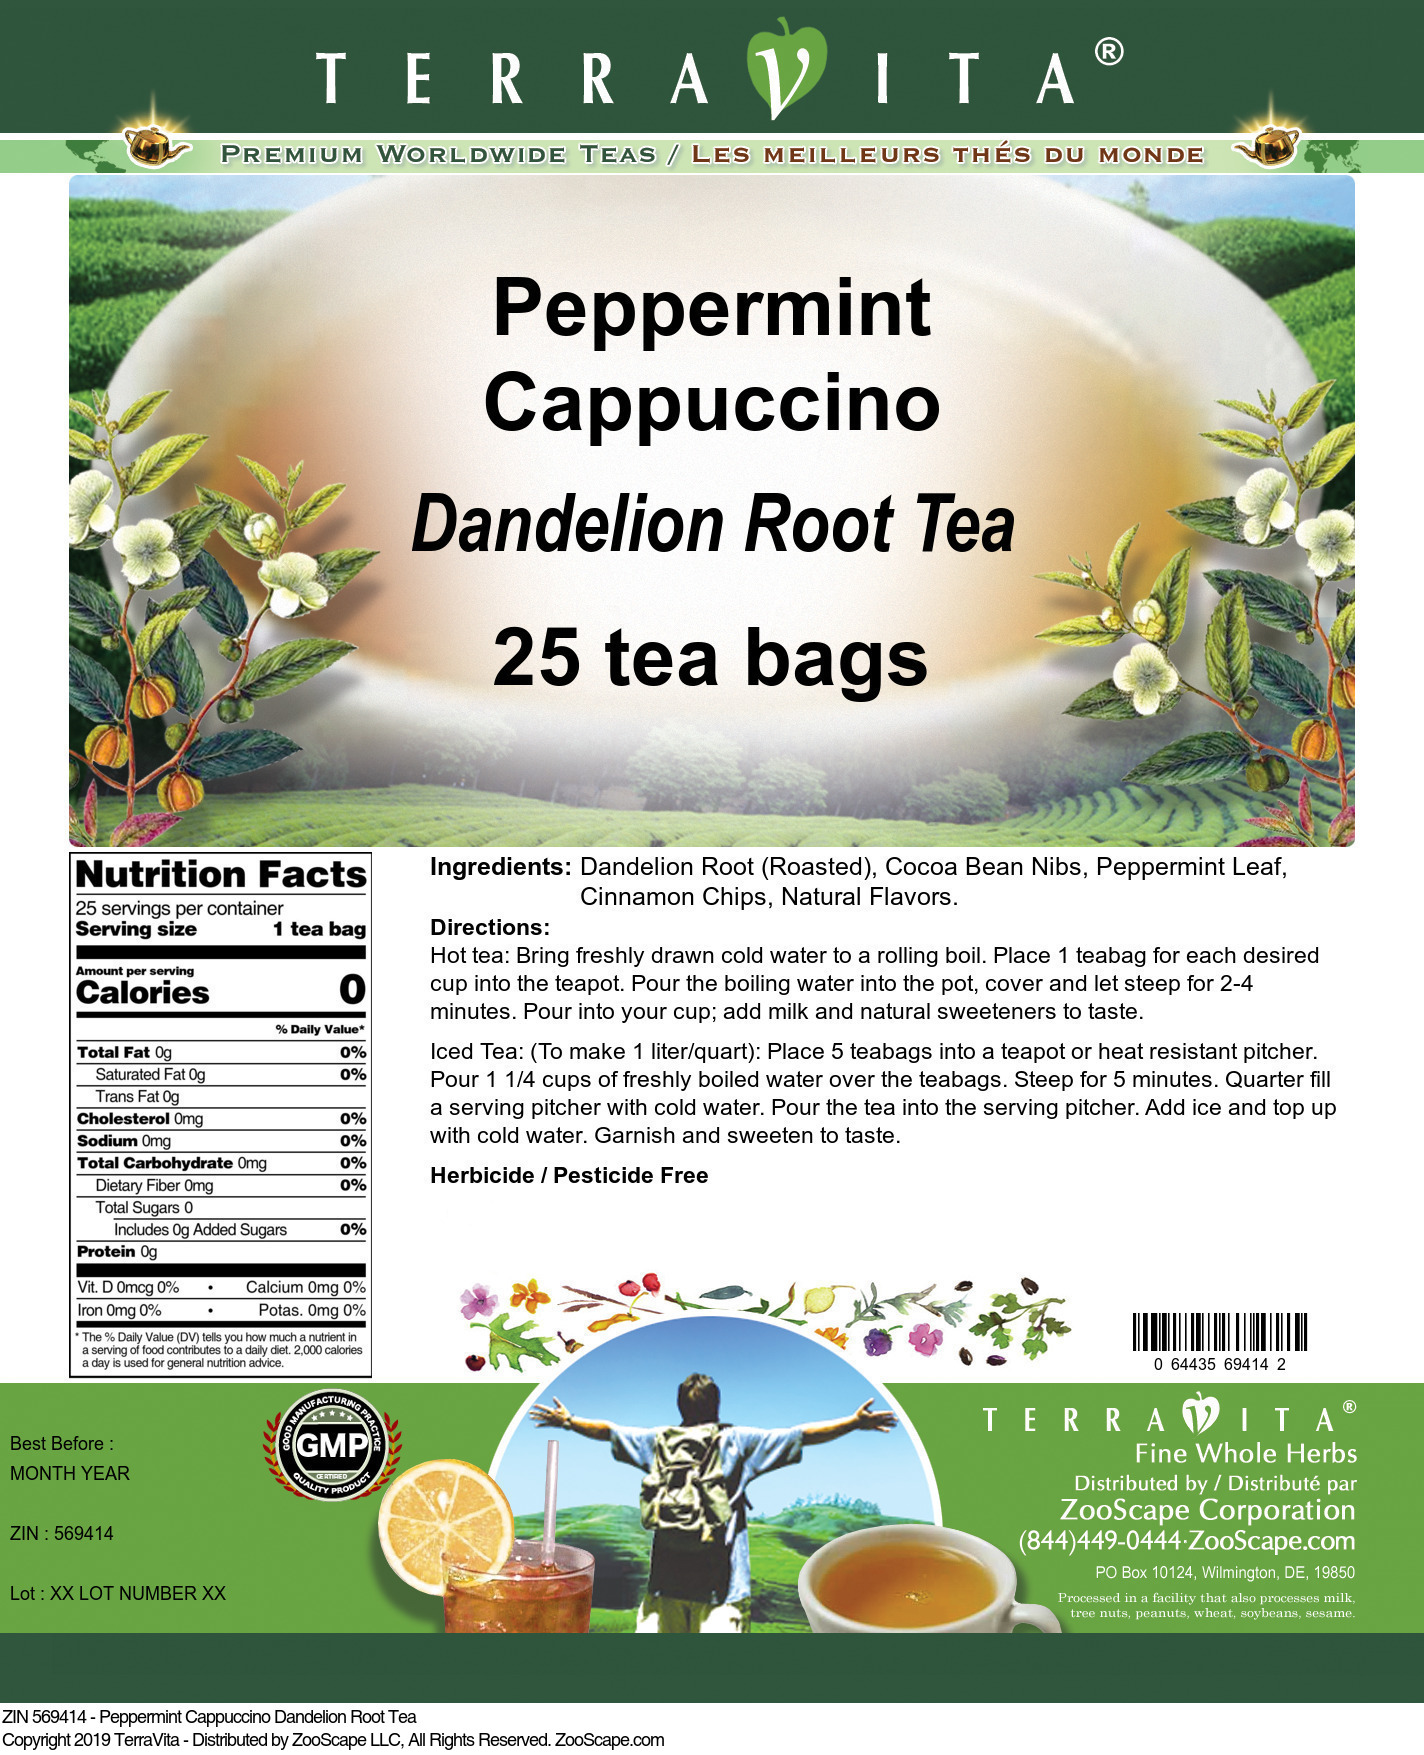 Peppermint Cappuccino Dandelion Root Tea